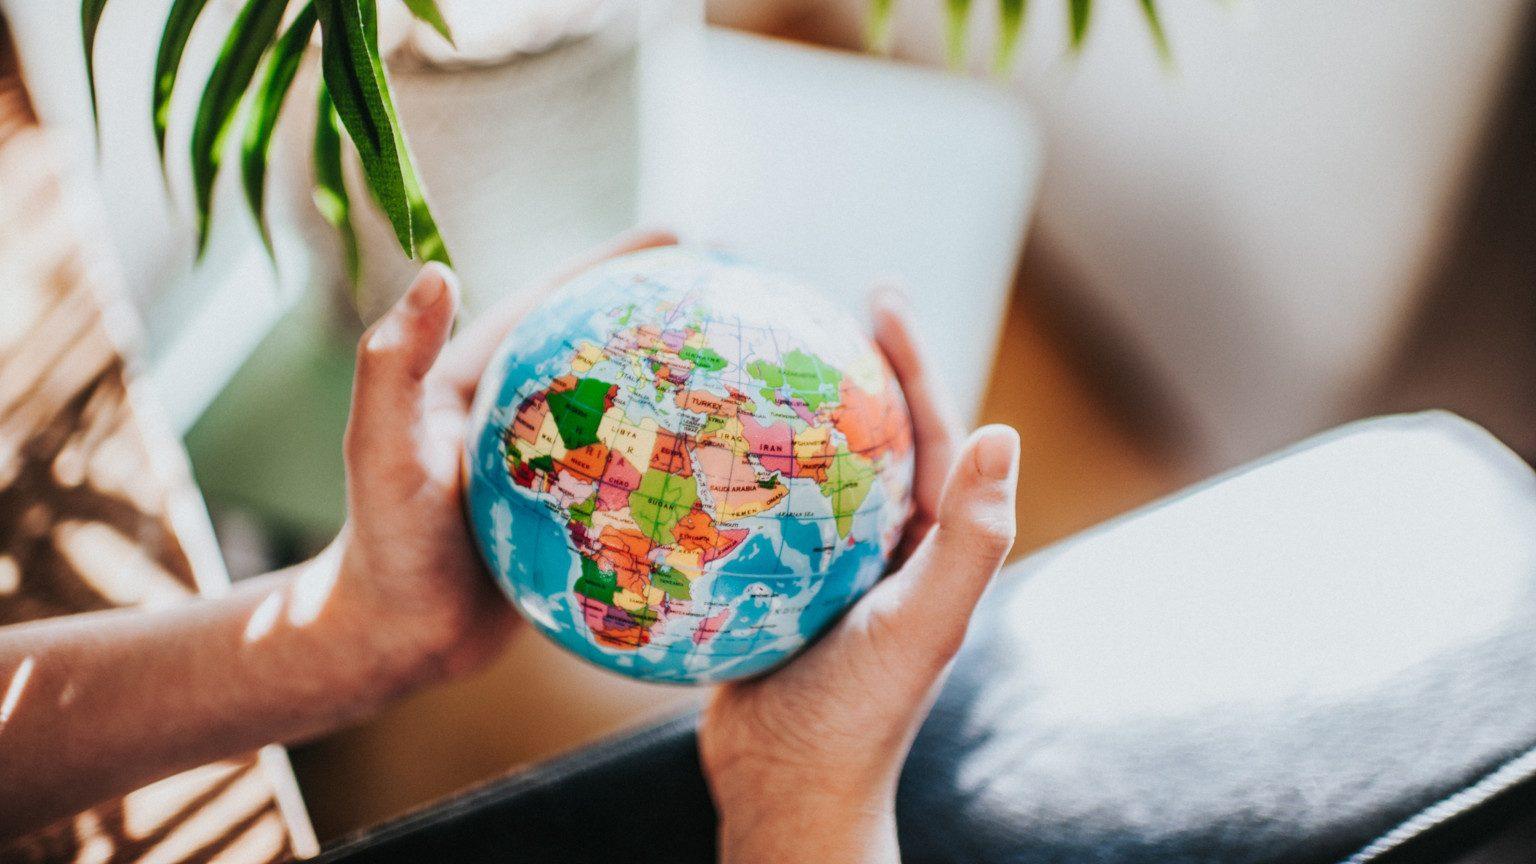 Hands holding a mini globe